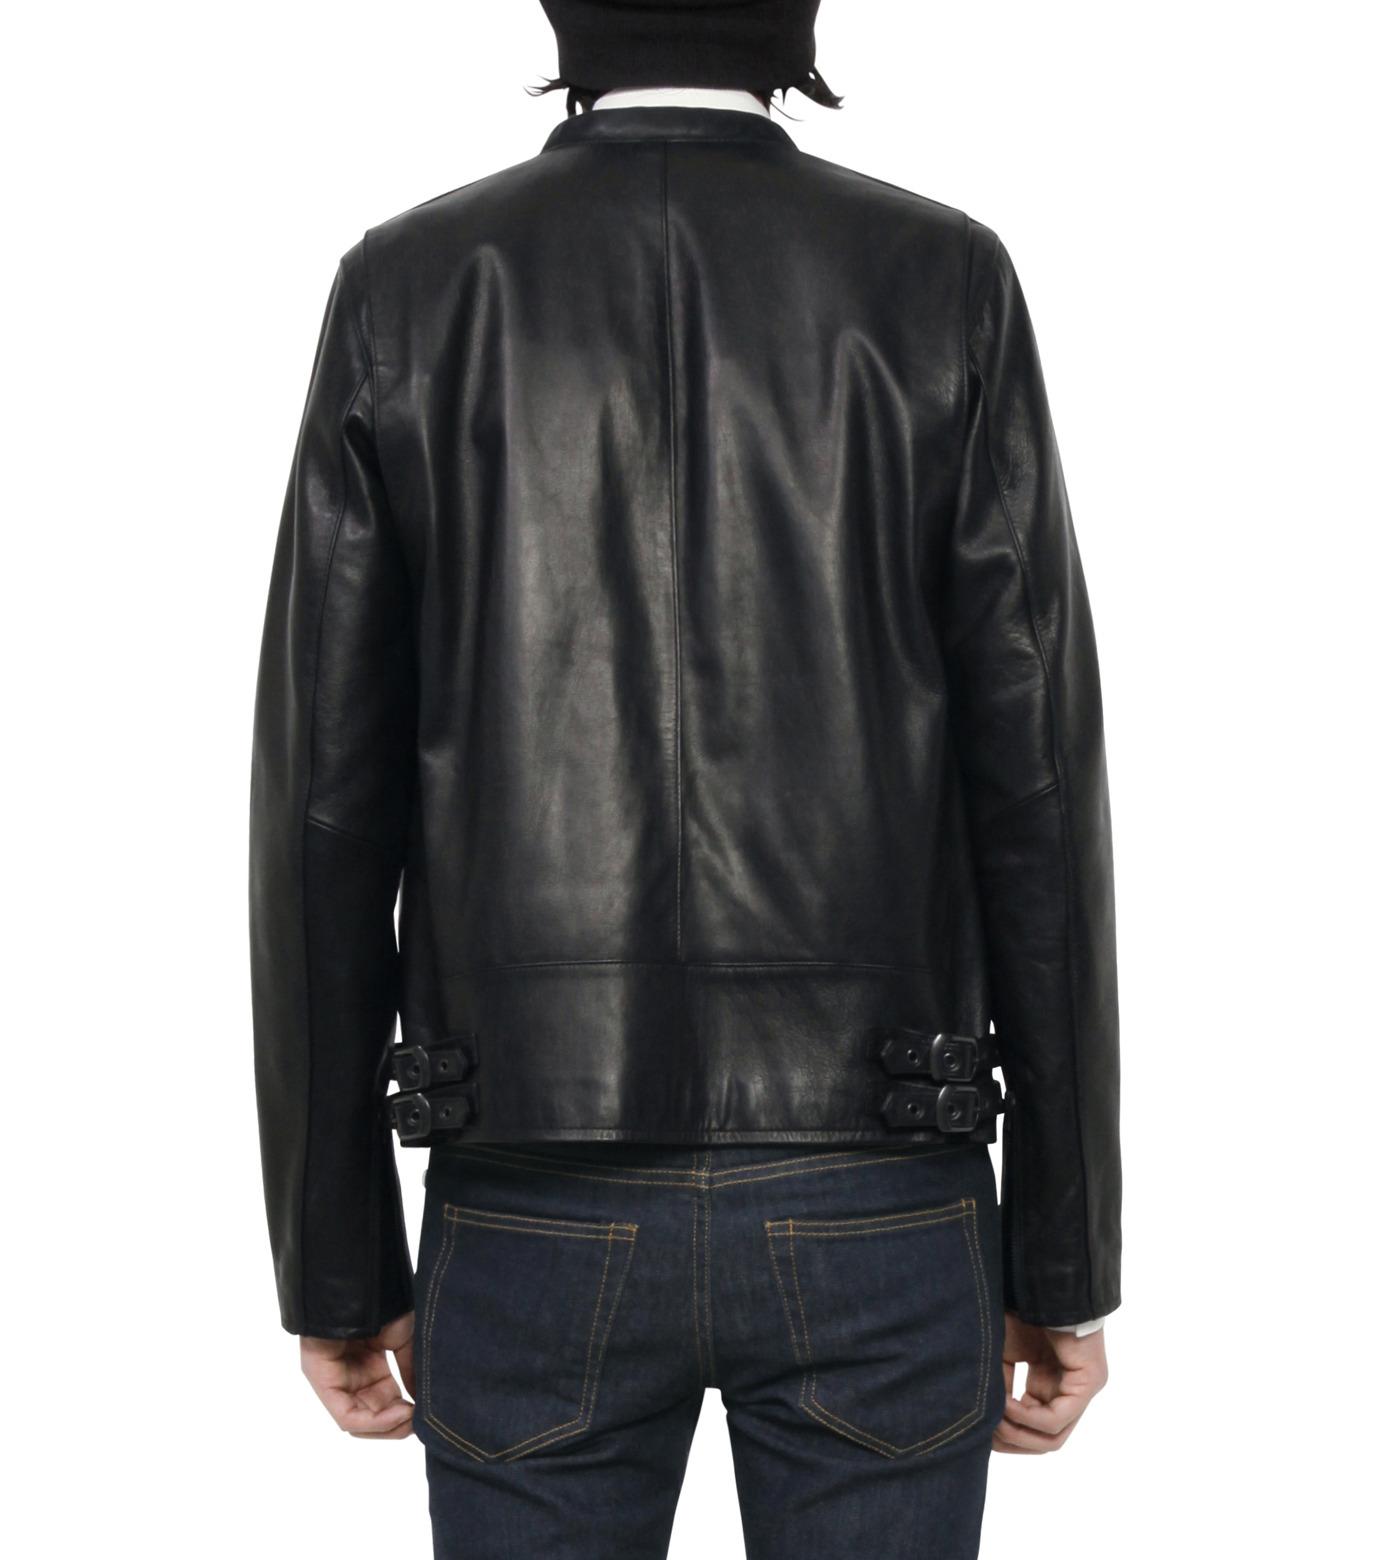 HL HEDDIE LOVU(エイチエル・エディールーヴ)のMINIMUM COLLAR LEATHER JACKET-BLACK(ジャケット/jacket)-18S94006-13 拡大詳細画像4